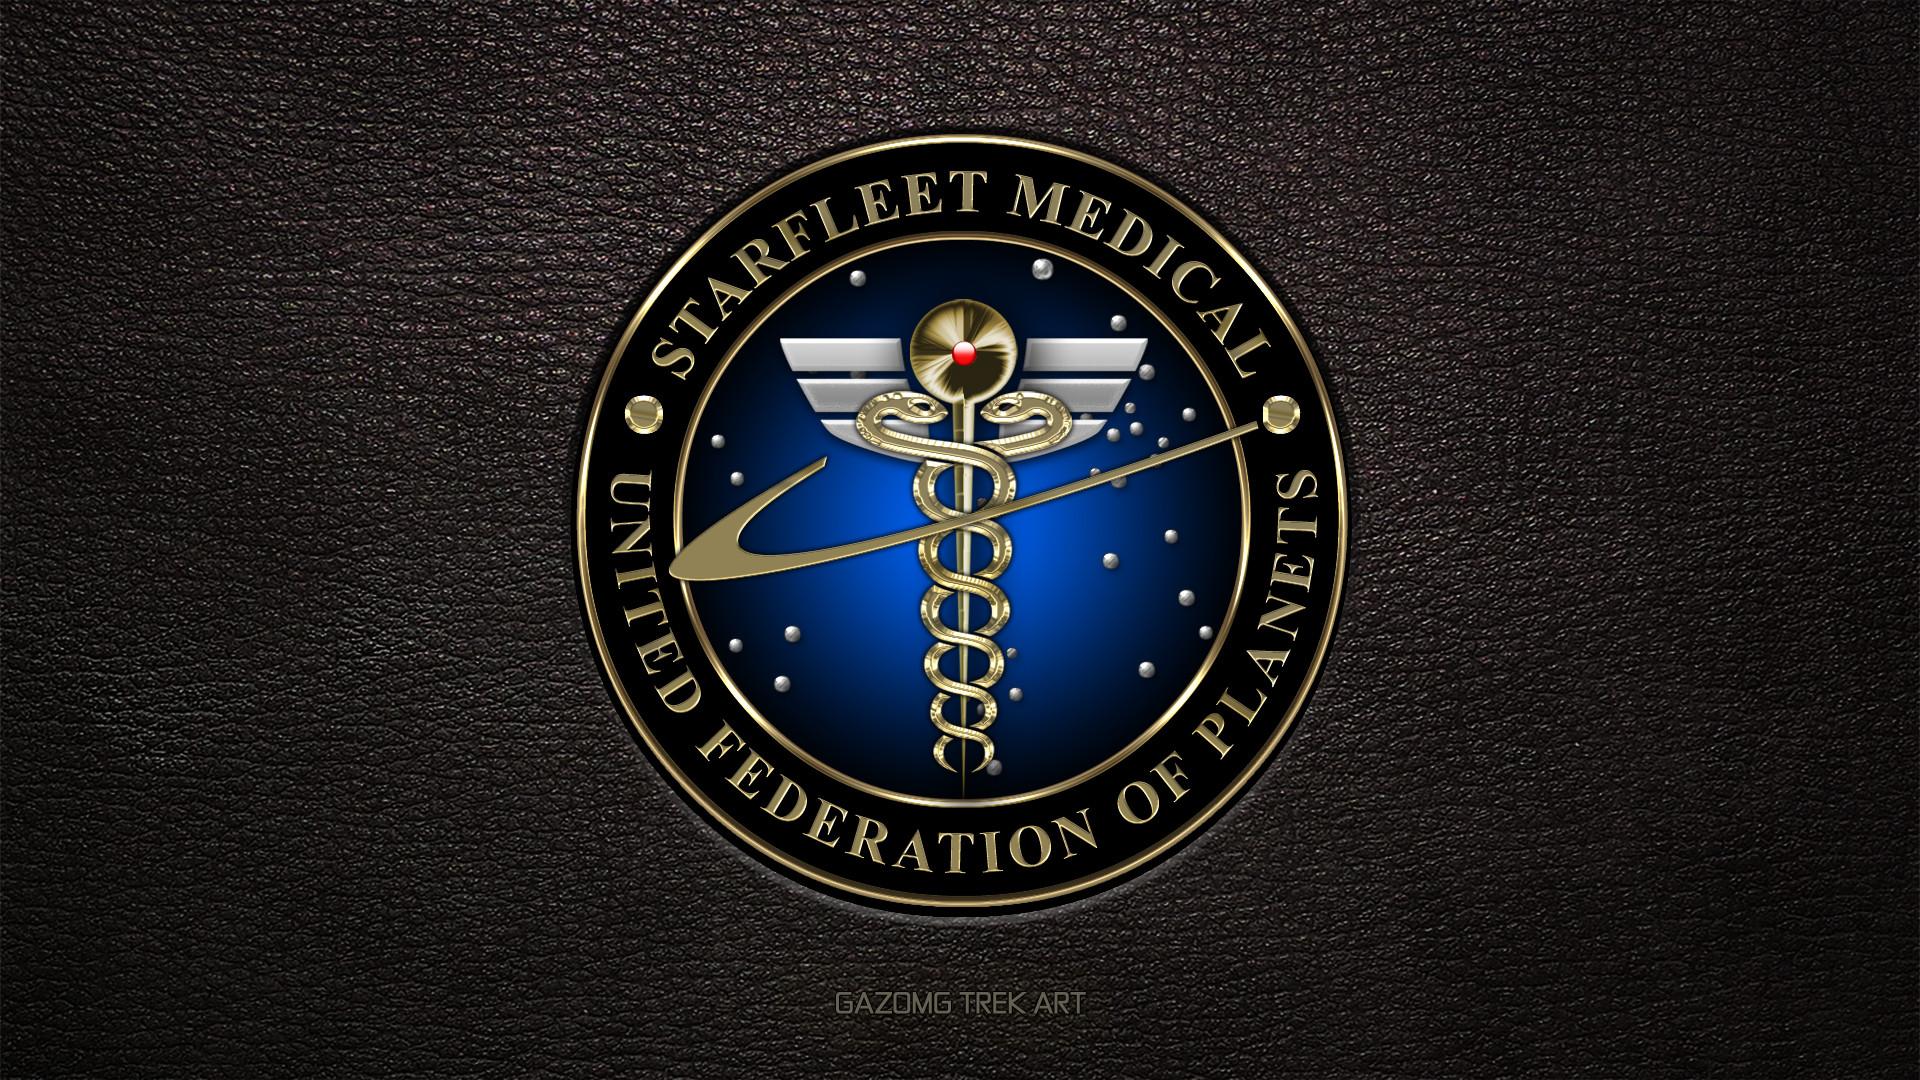 … Starfleet Medical Logo Star Trek (updated) by gazomg